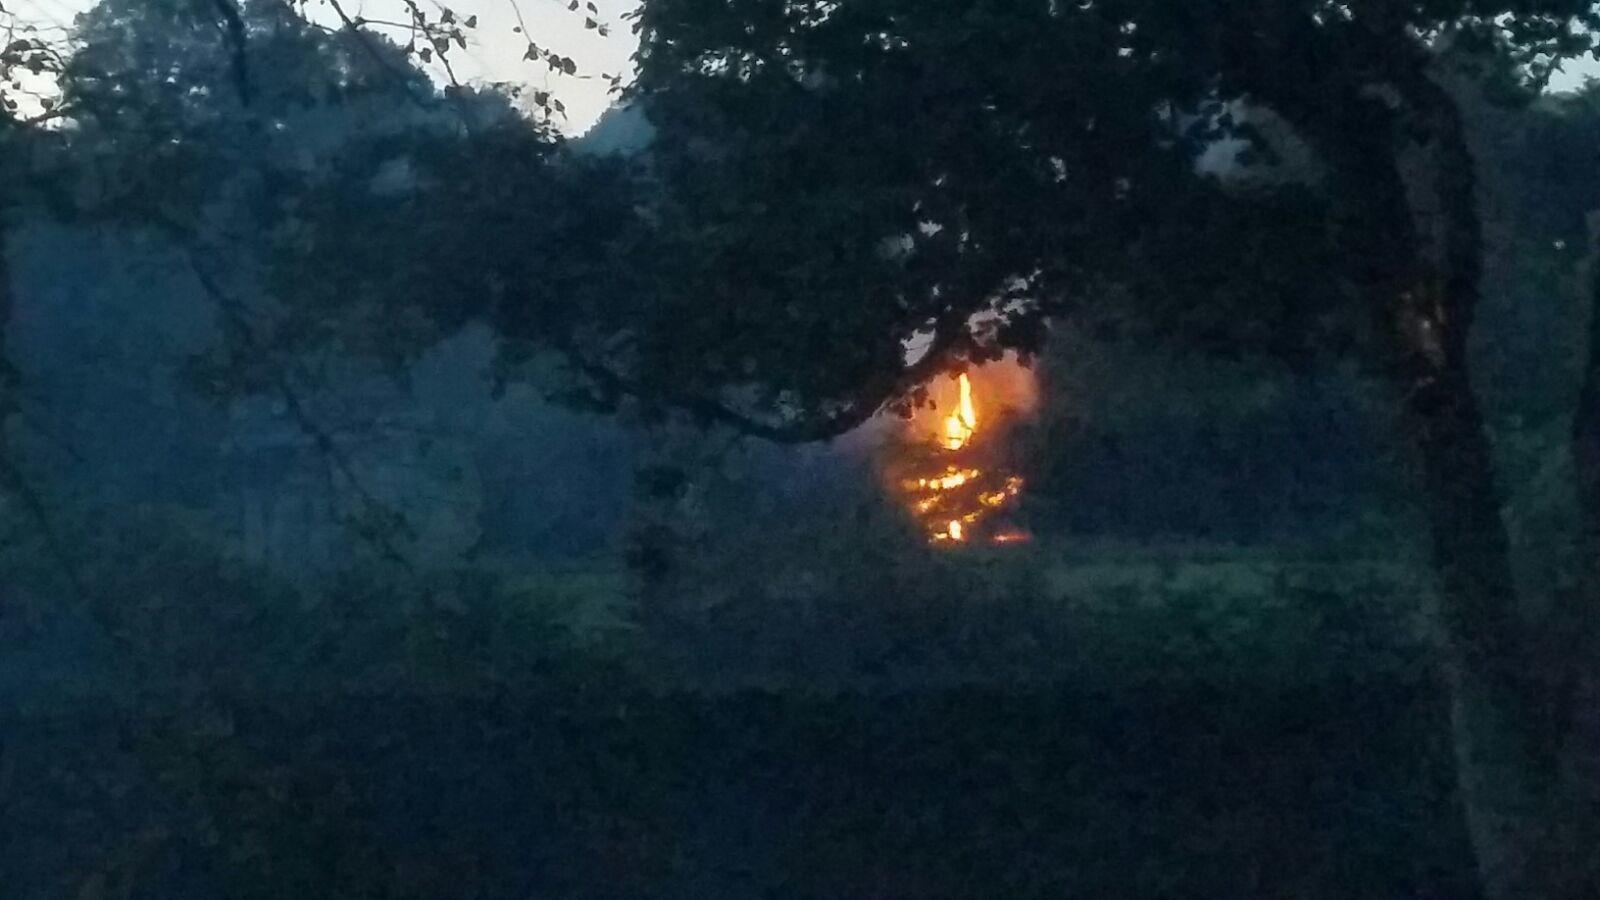 The blaze at Baxter Park from a distance